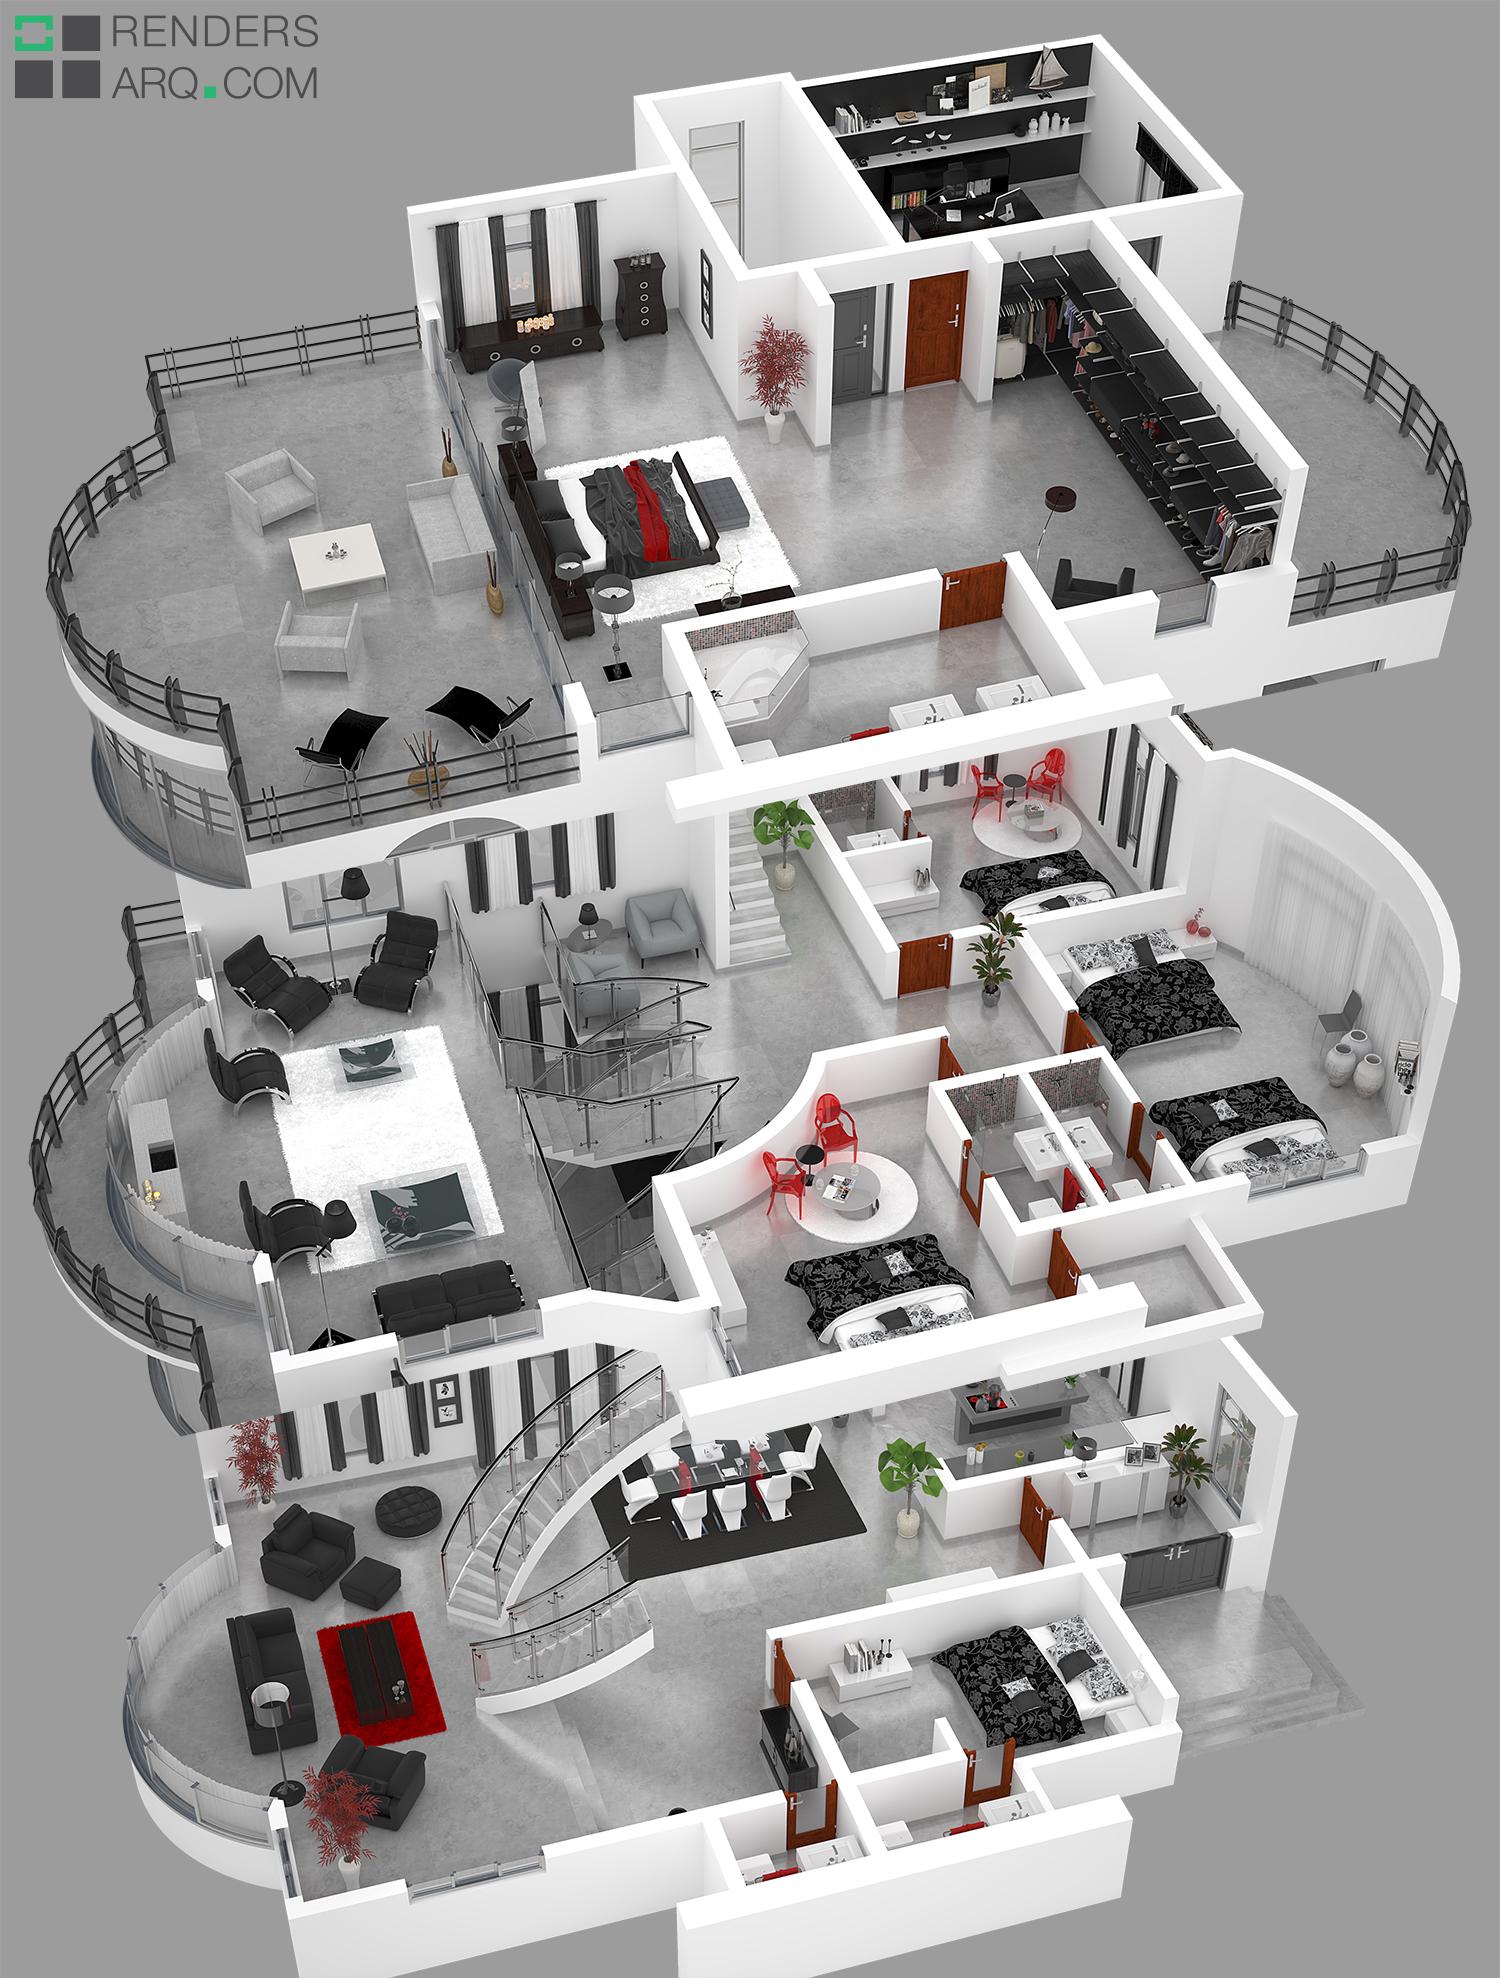 Plantas 3d uganda renders arquitectura for Plantas de oficinas arquitectura